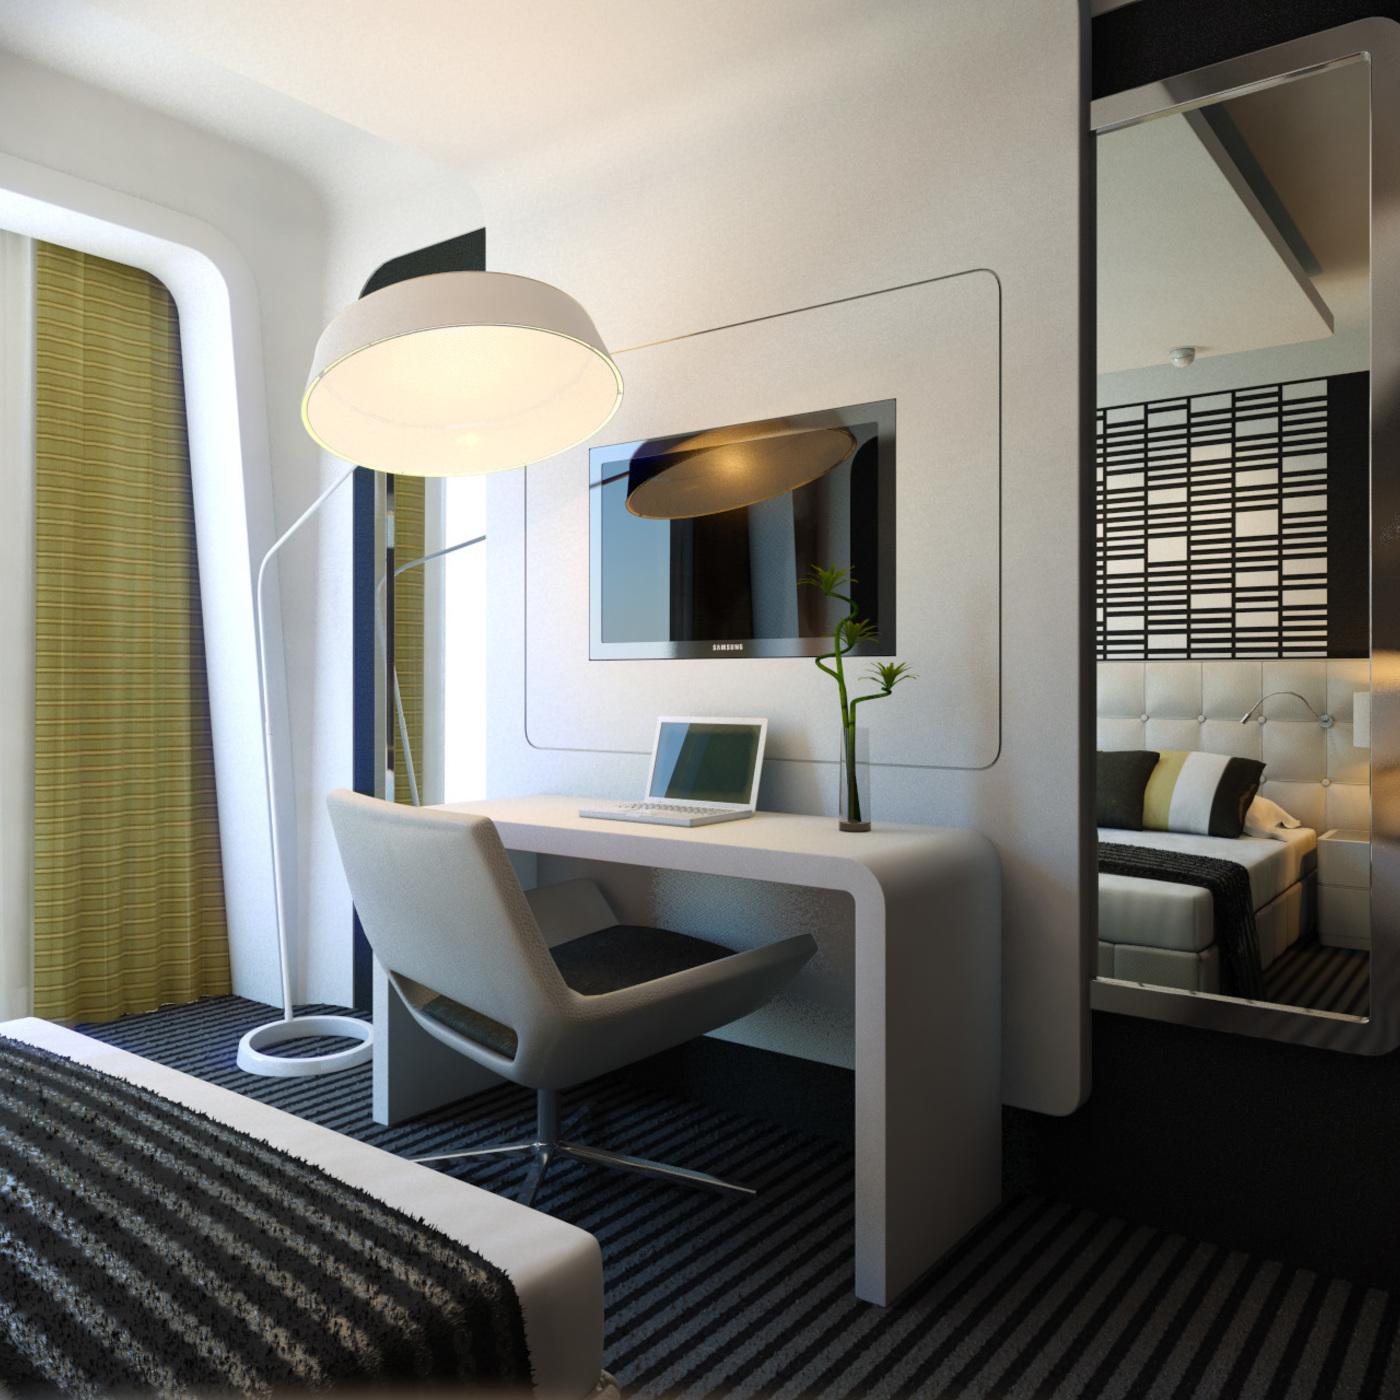 Smart Hotel Airport Room